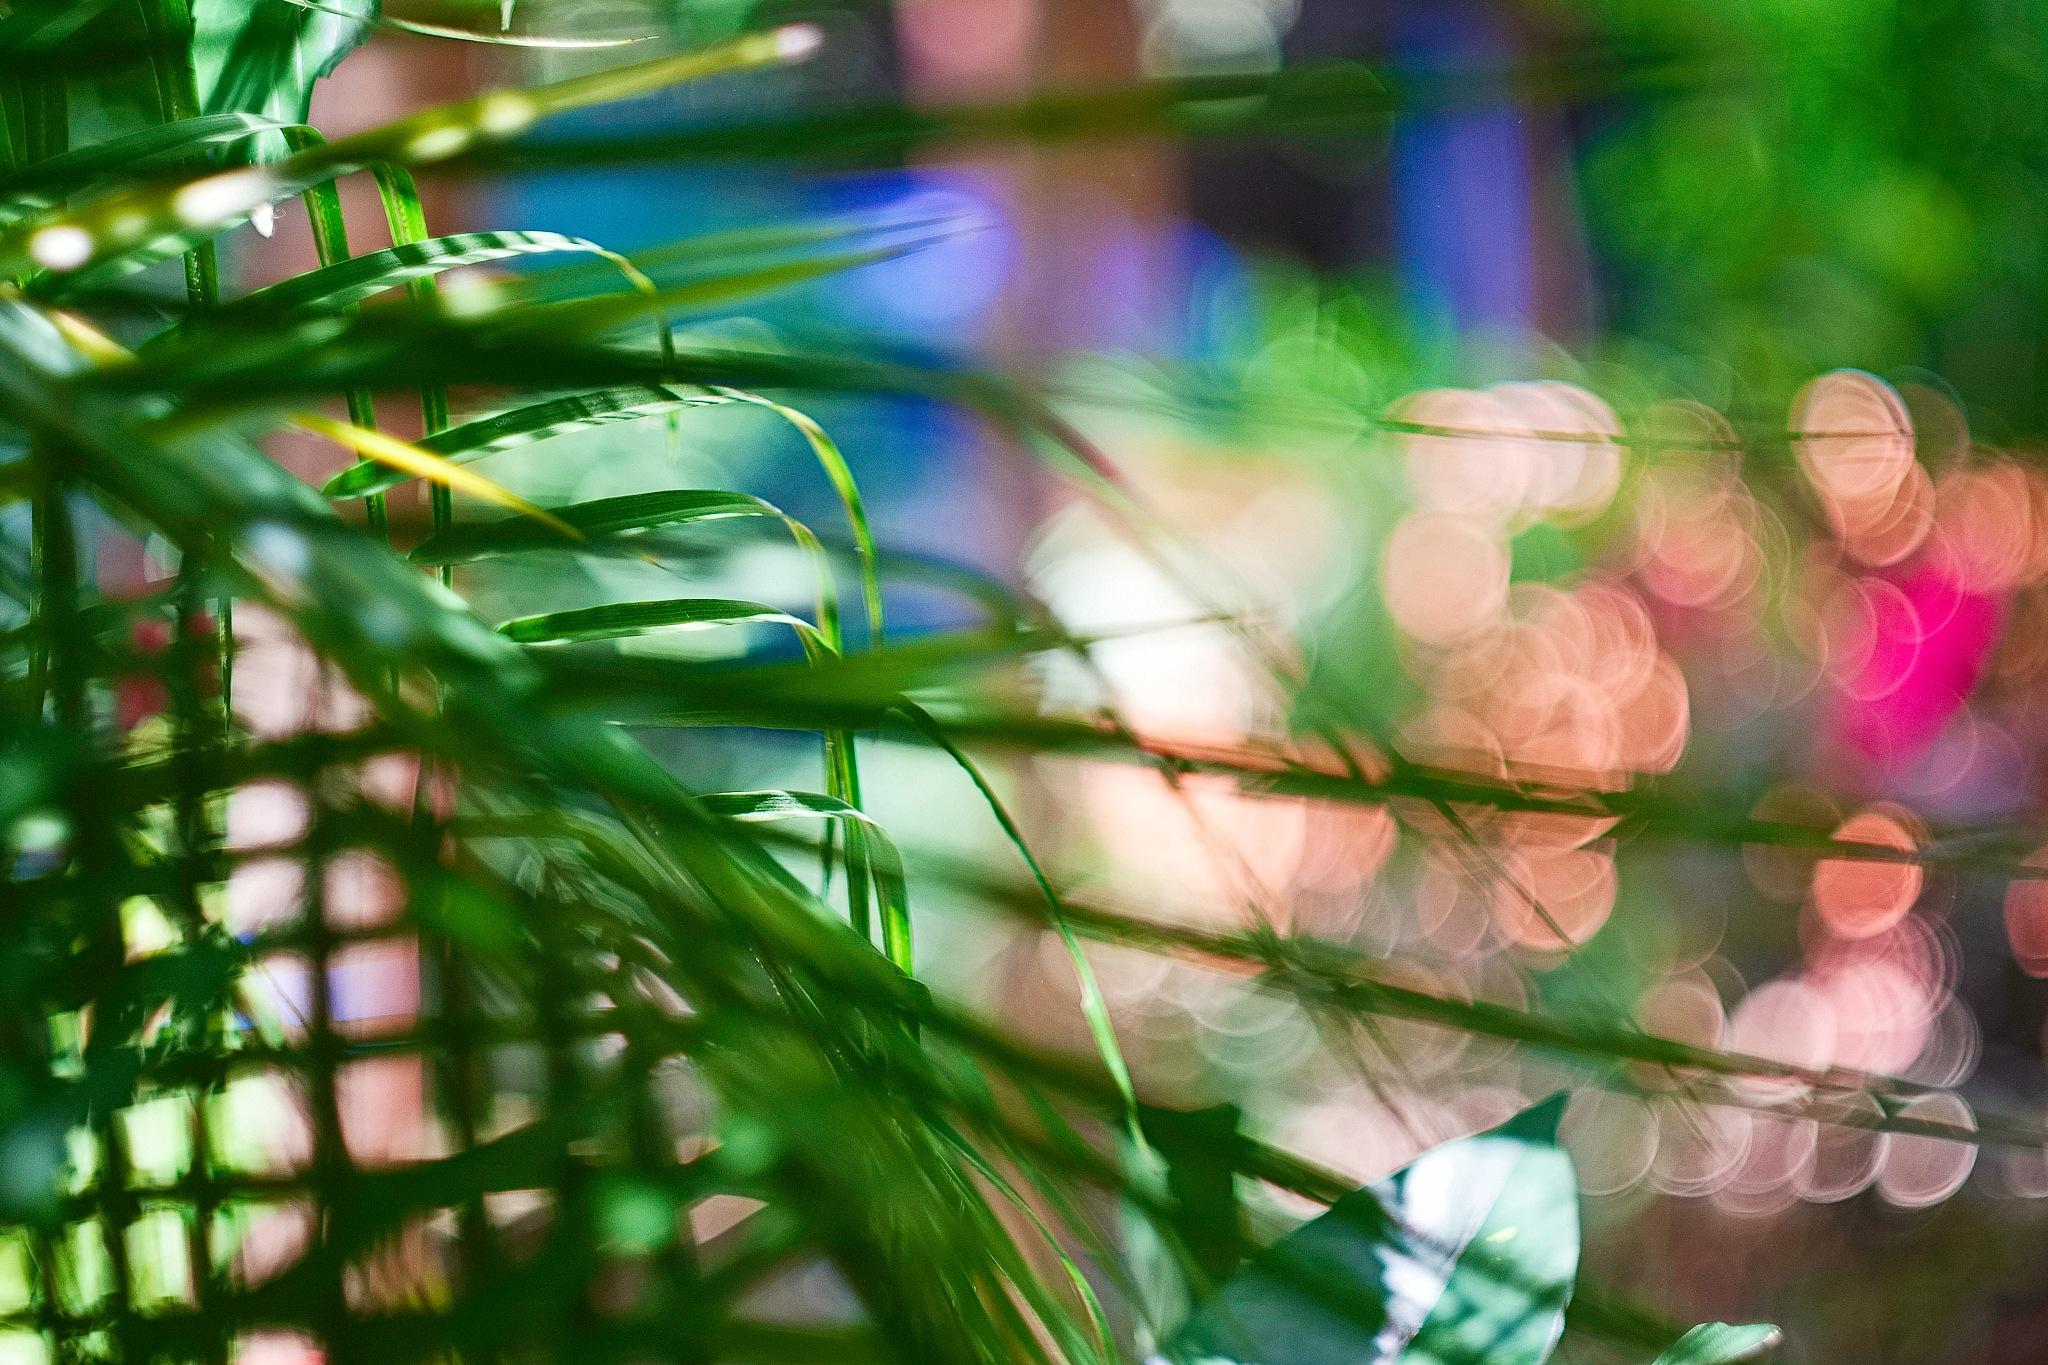 Palms, Tropical Light & Bokeh by Smilin' Dog